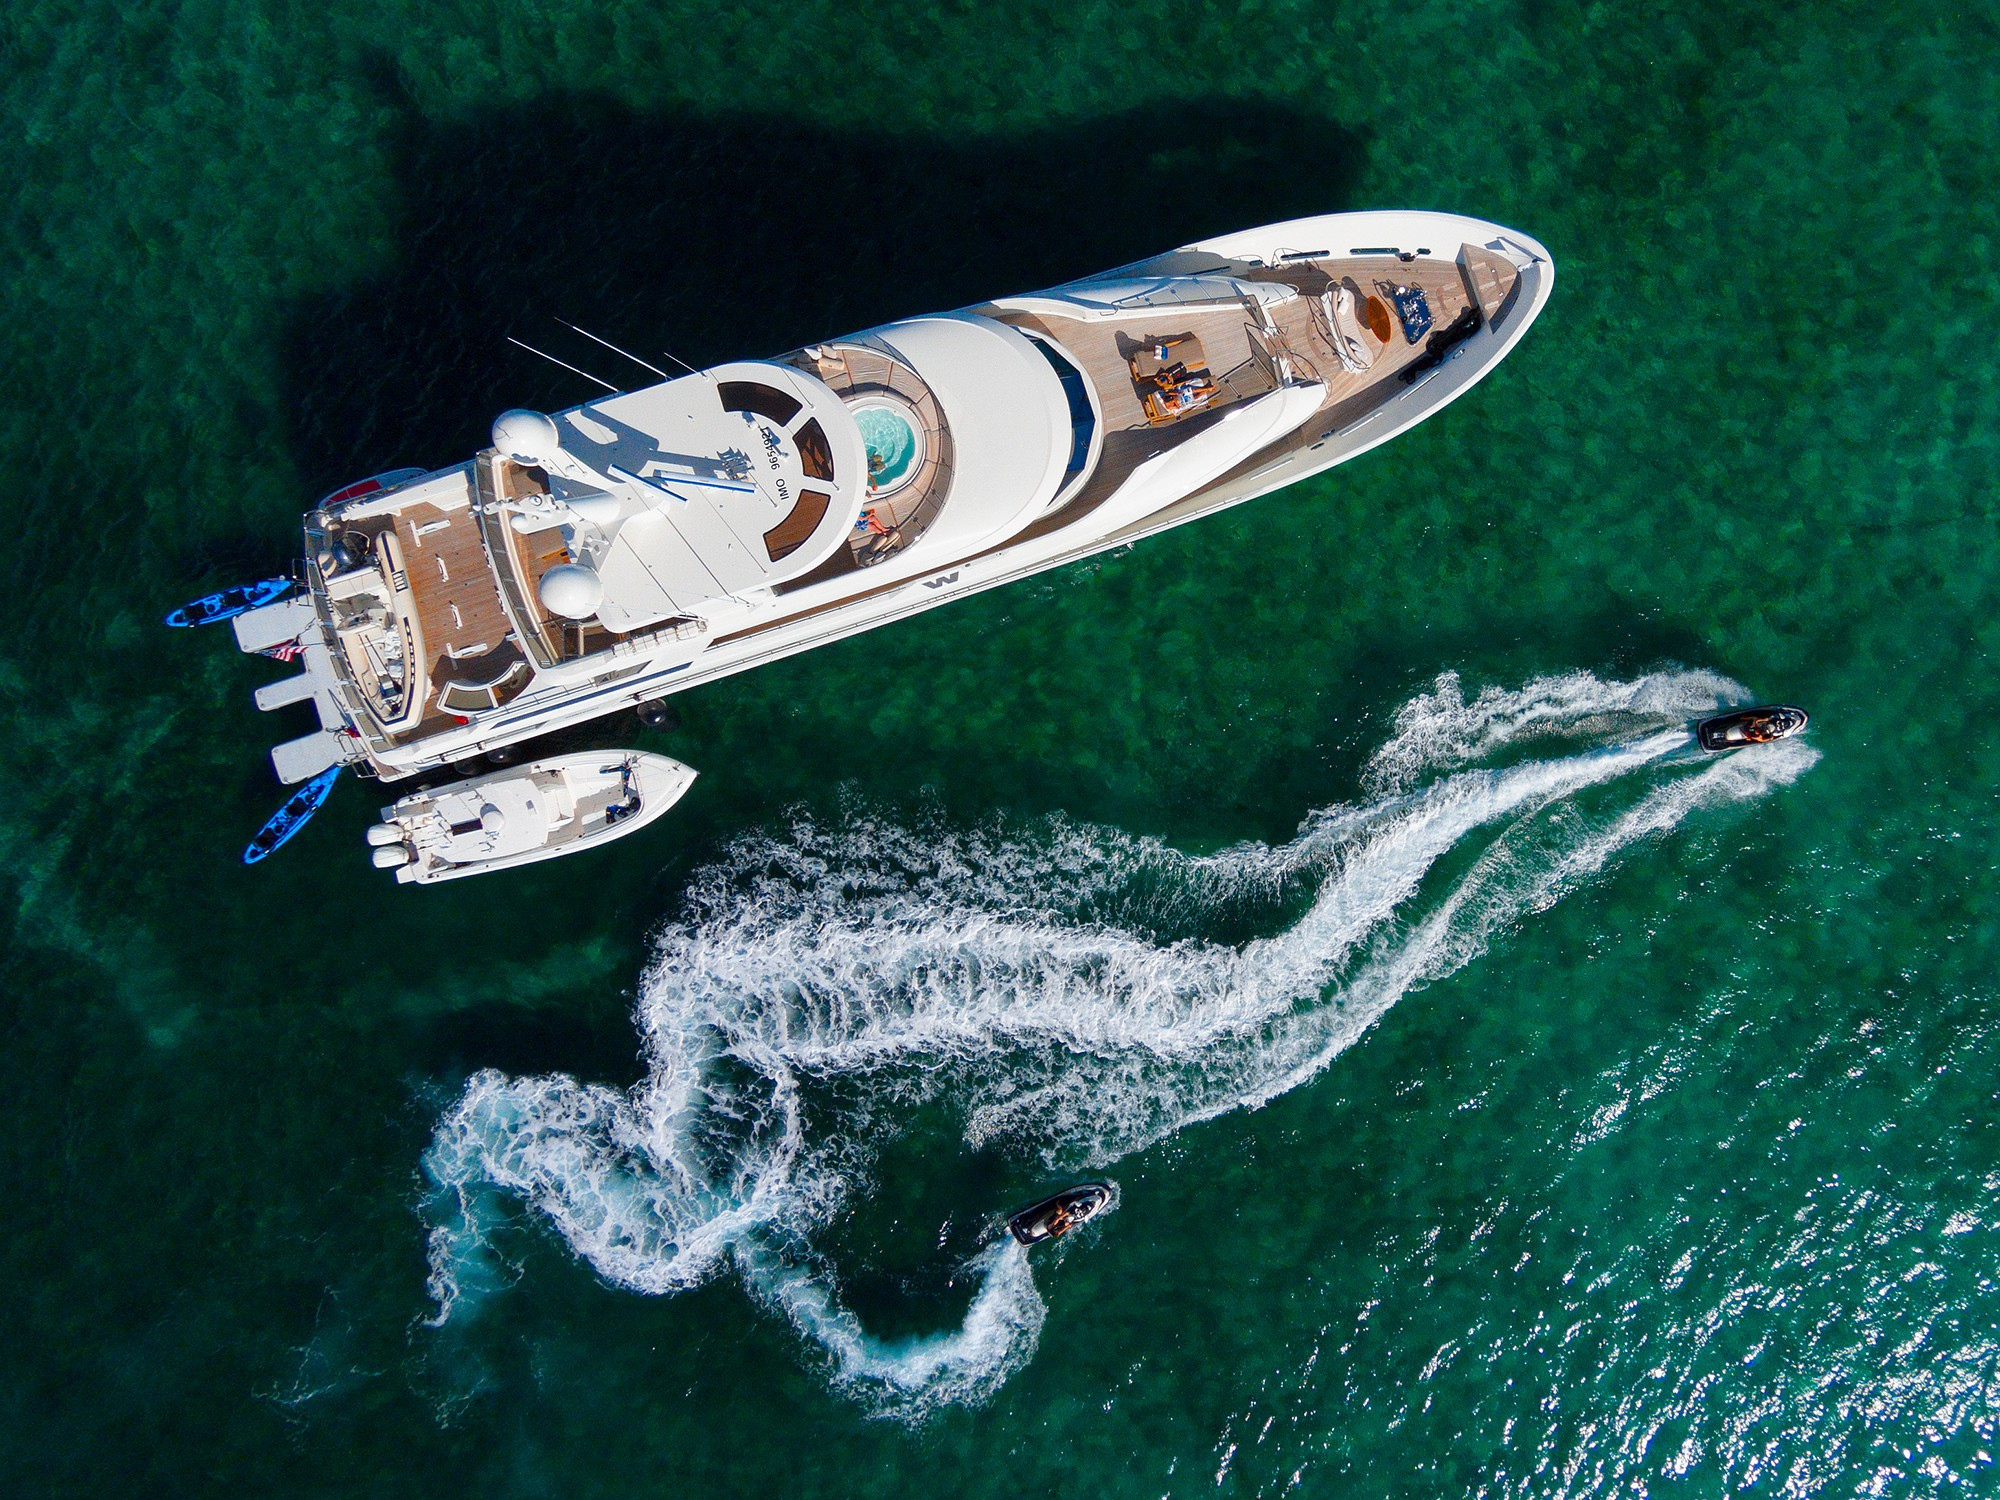 The 39m Yacht W